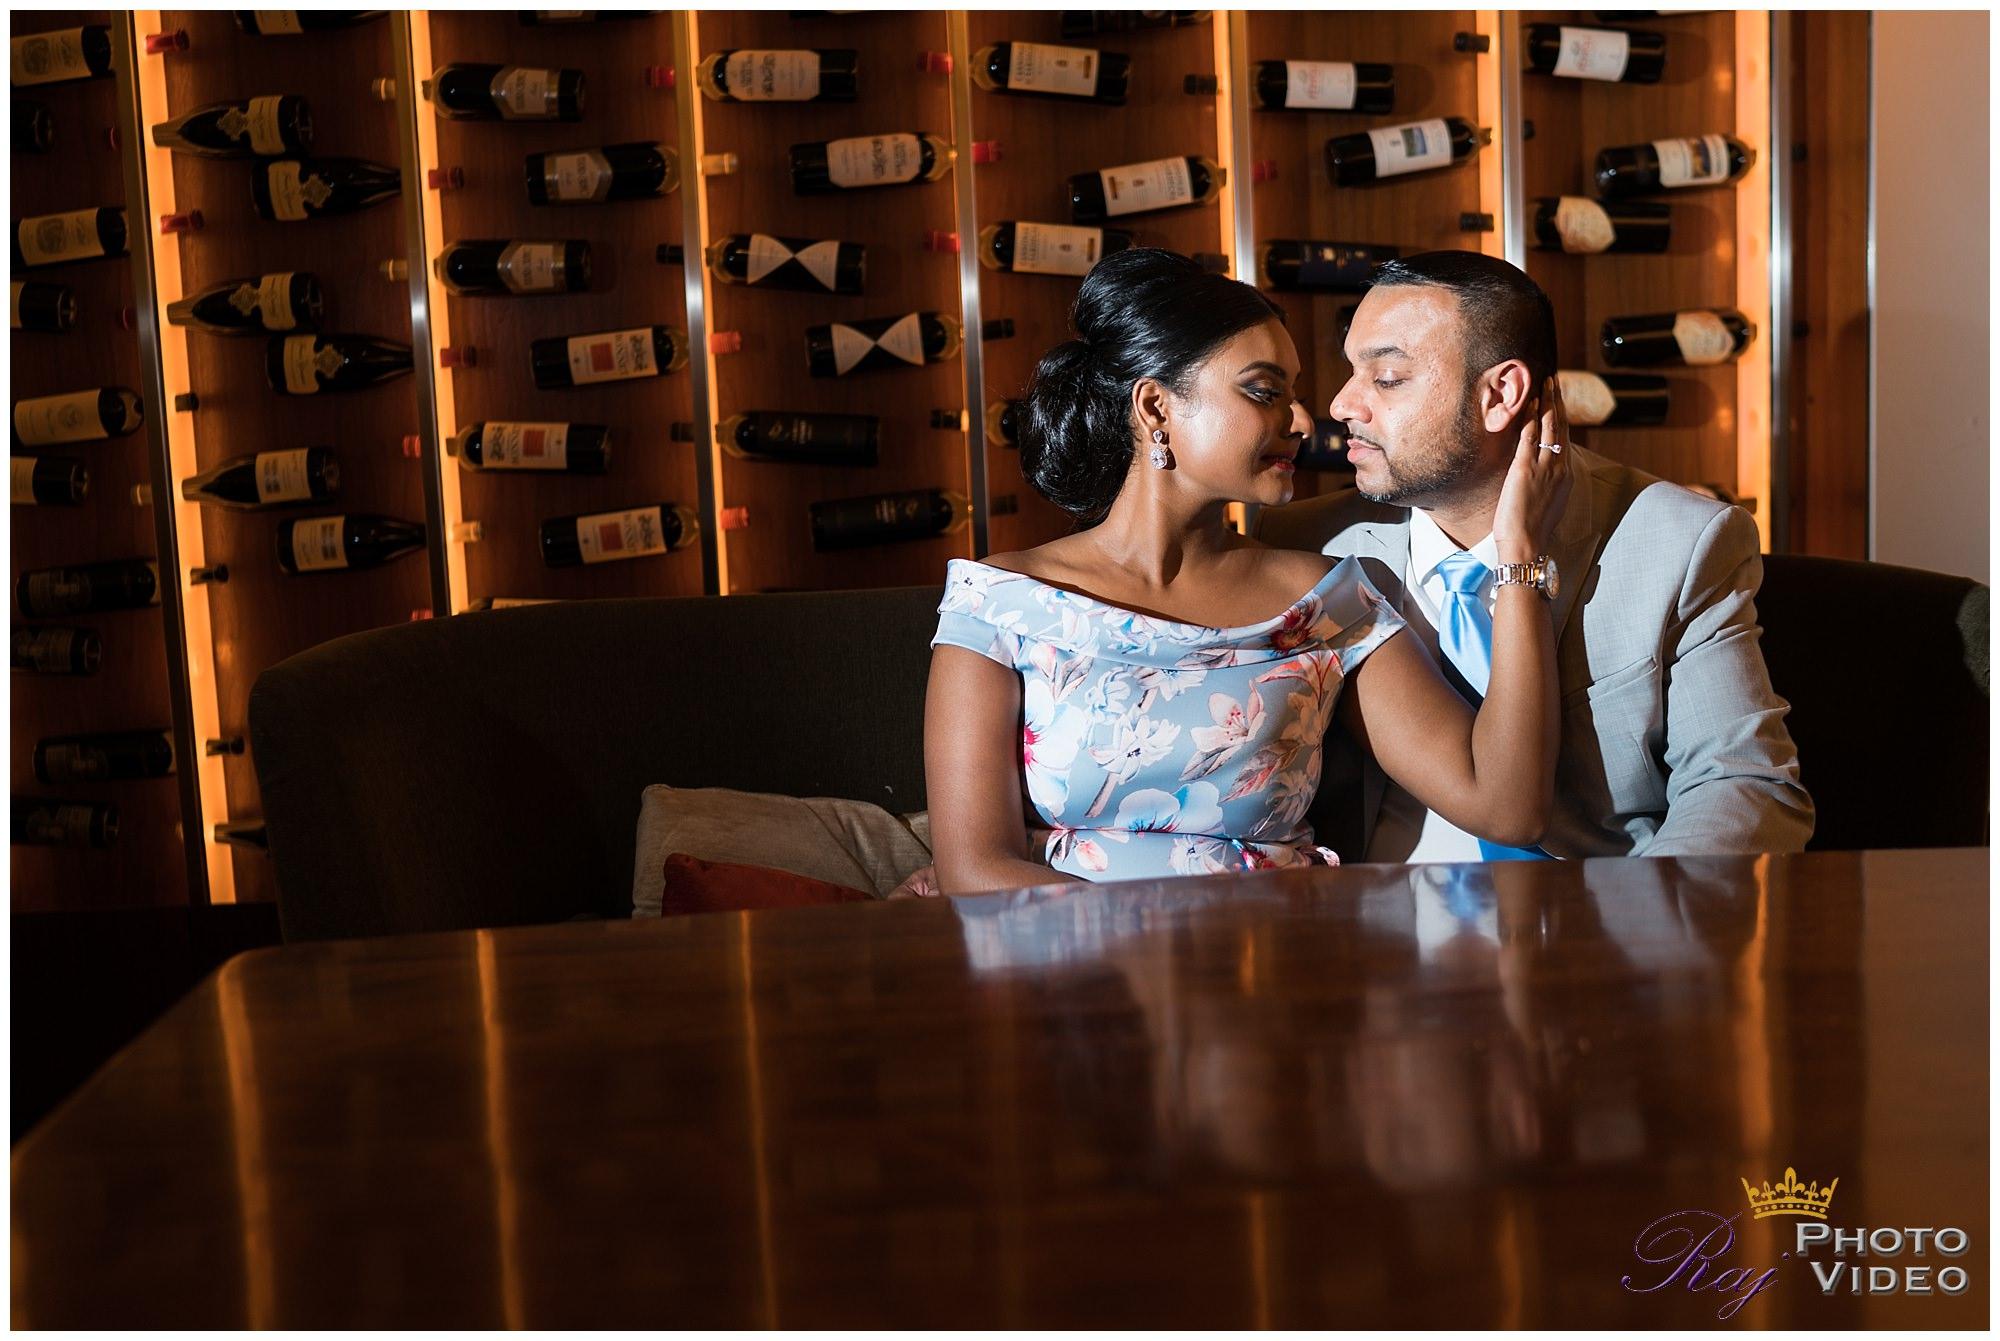 Conrad-Hotel-New-York-City-Engagement-Shoot-Diana-Shaun-9.jpg